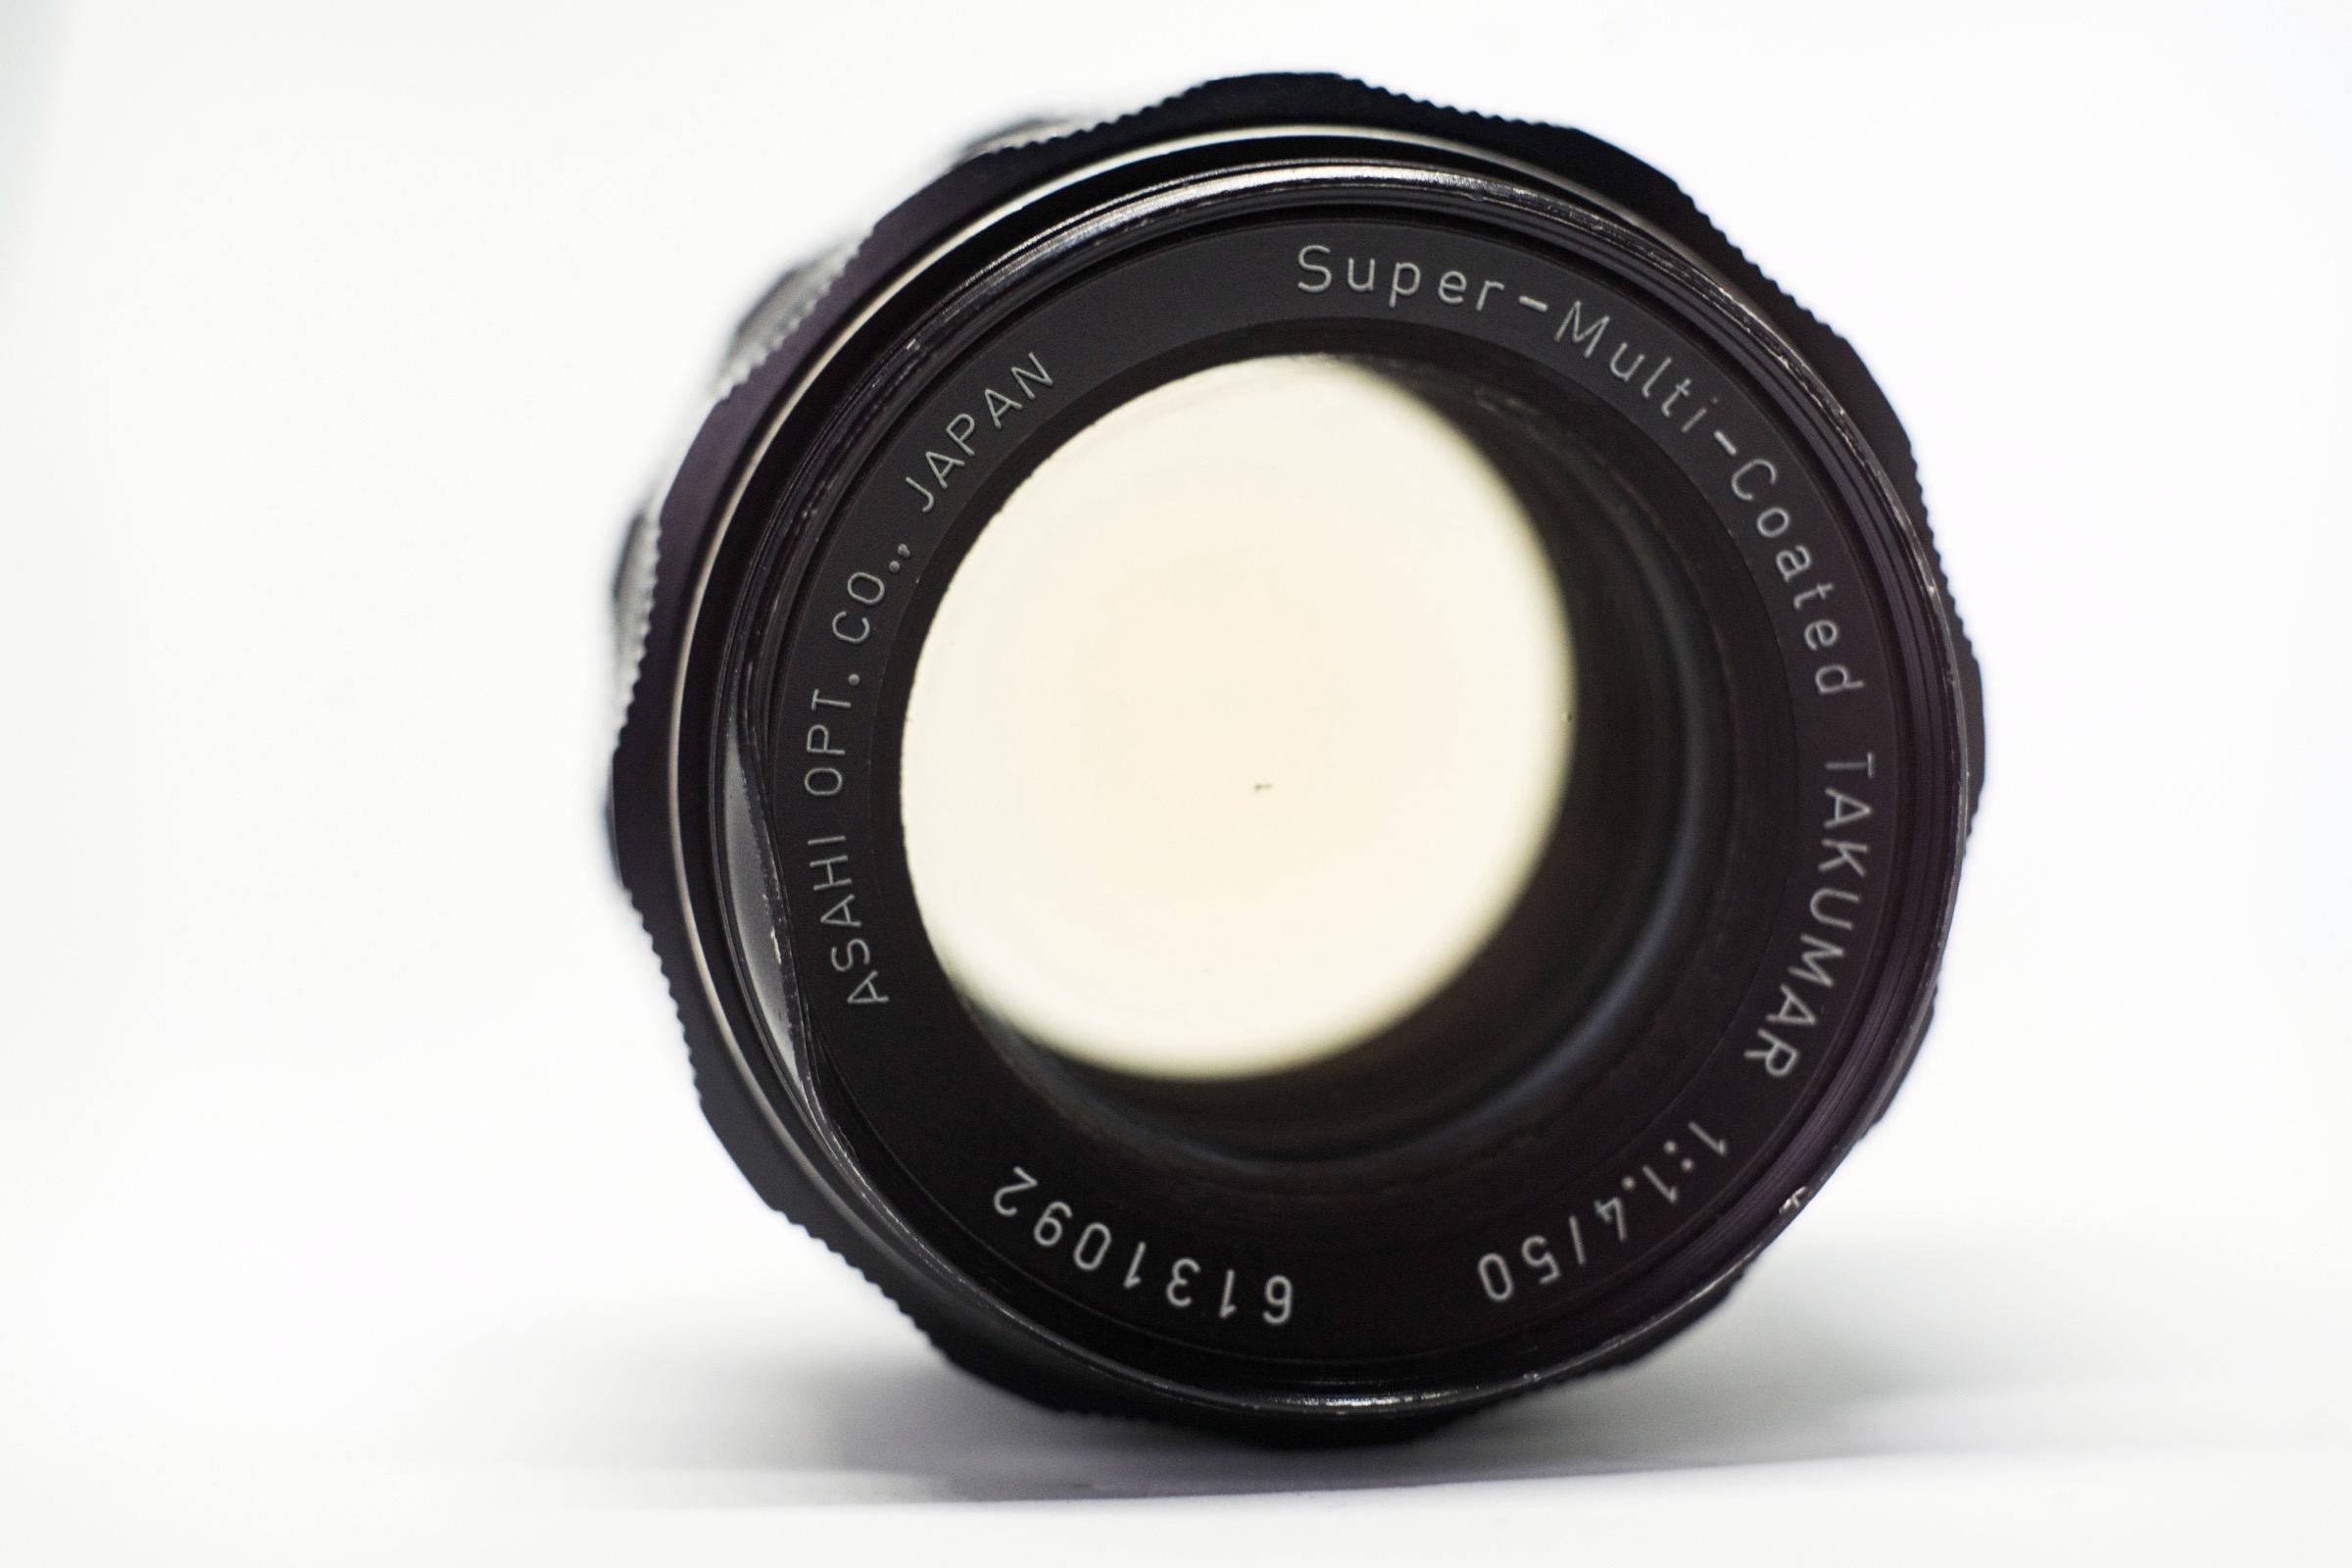 Super Multi Coated Takumar 50mm f1.4